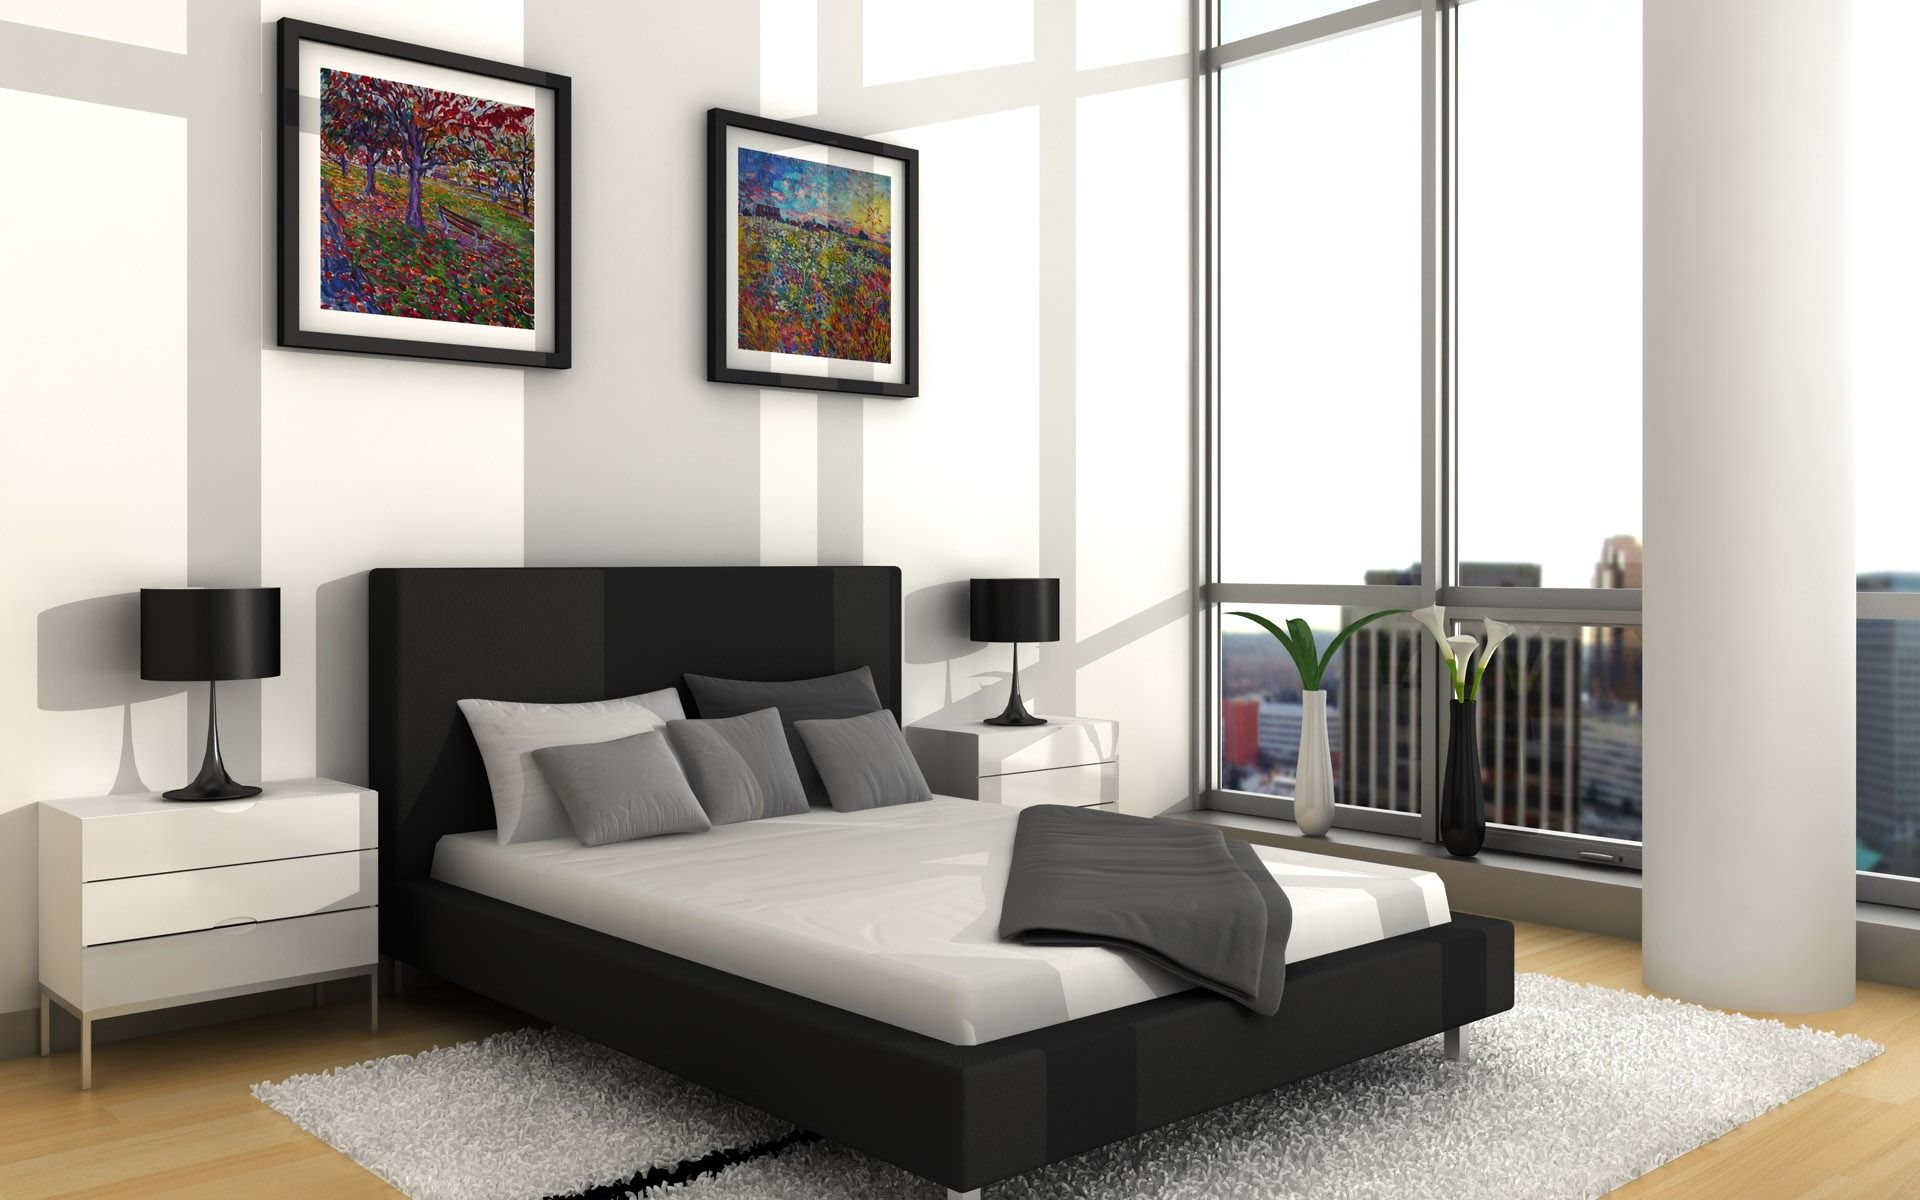 avkb مجموعة صور لديكورات غرف نوم 2014 حديثة ومودرن و تركيةوكلاسيكية من أحدث وأجمل وأفخم تشكيلة ديكورات غرف نوم 2014